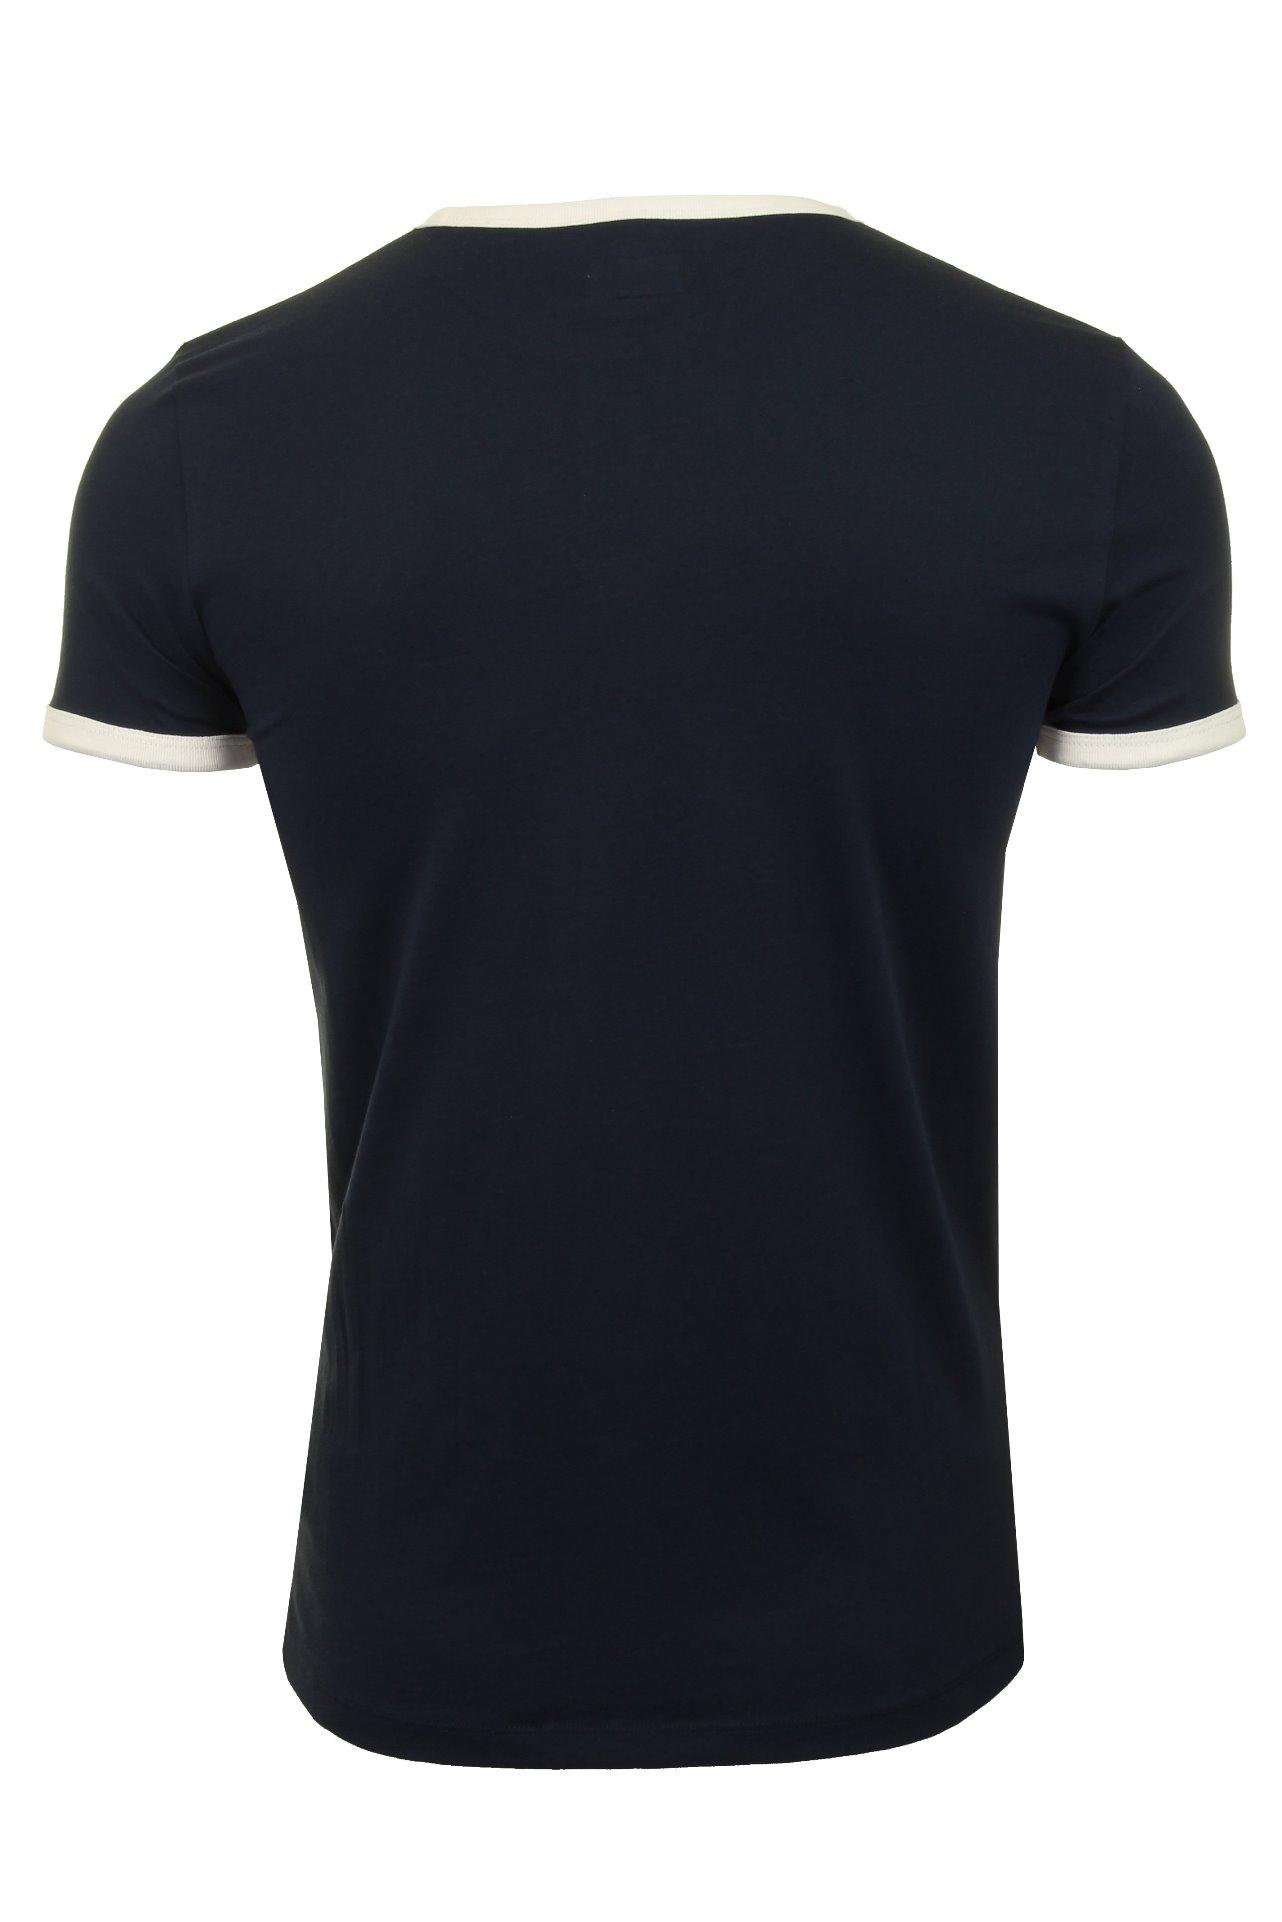 WRANGLER-034-Kabel-Tee-039-T-shirt-a-manches-courtes miniature 5